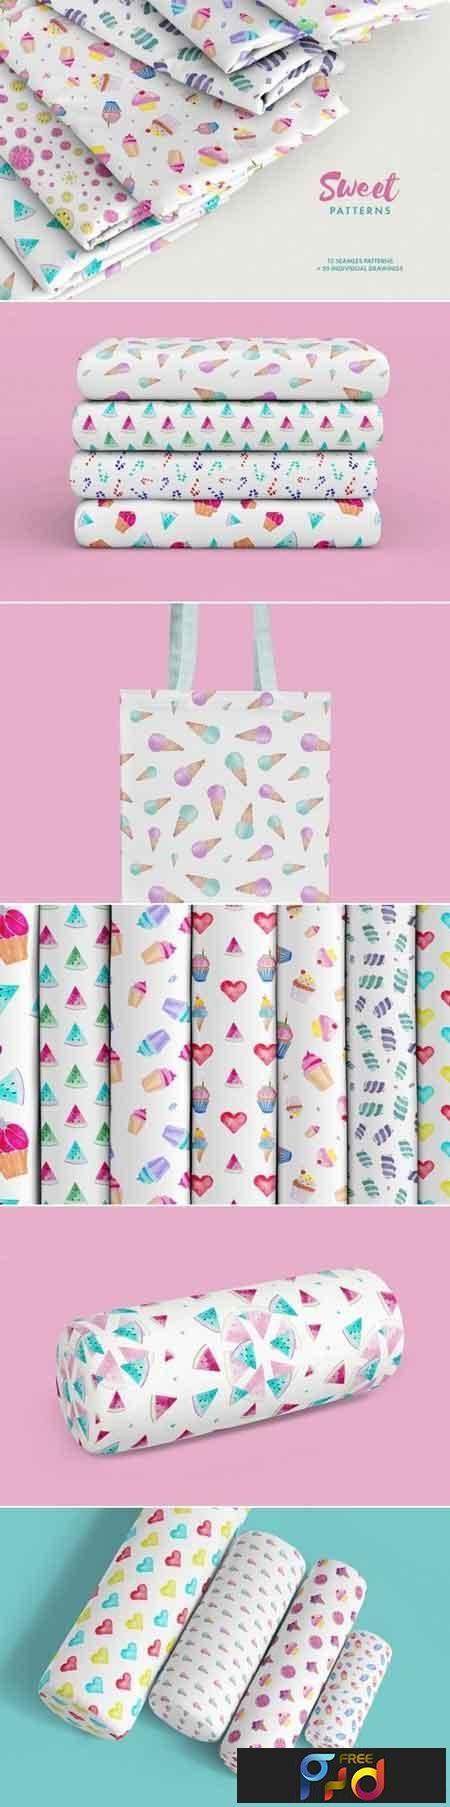 Watercolor Sweet Patterns 3477781 1